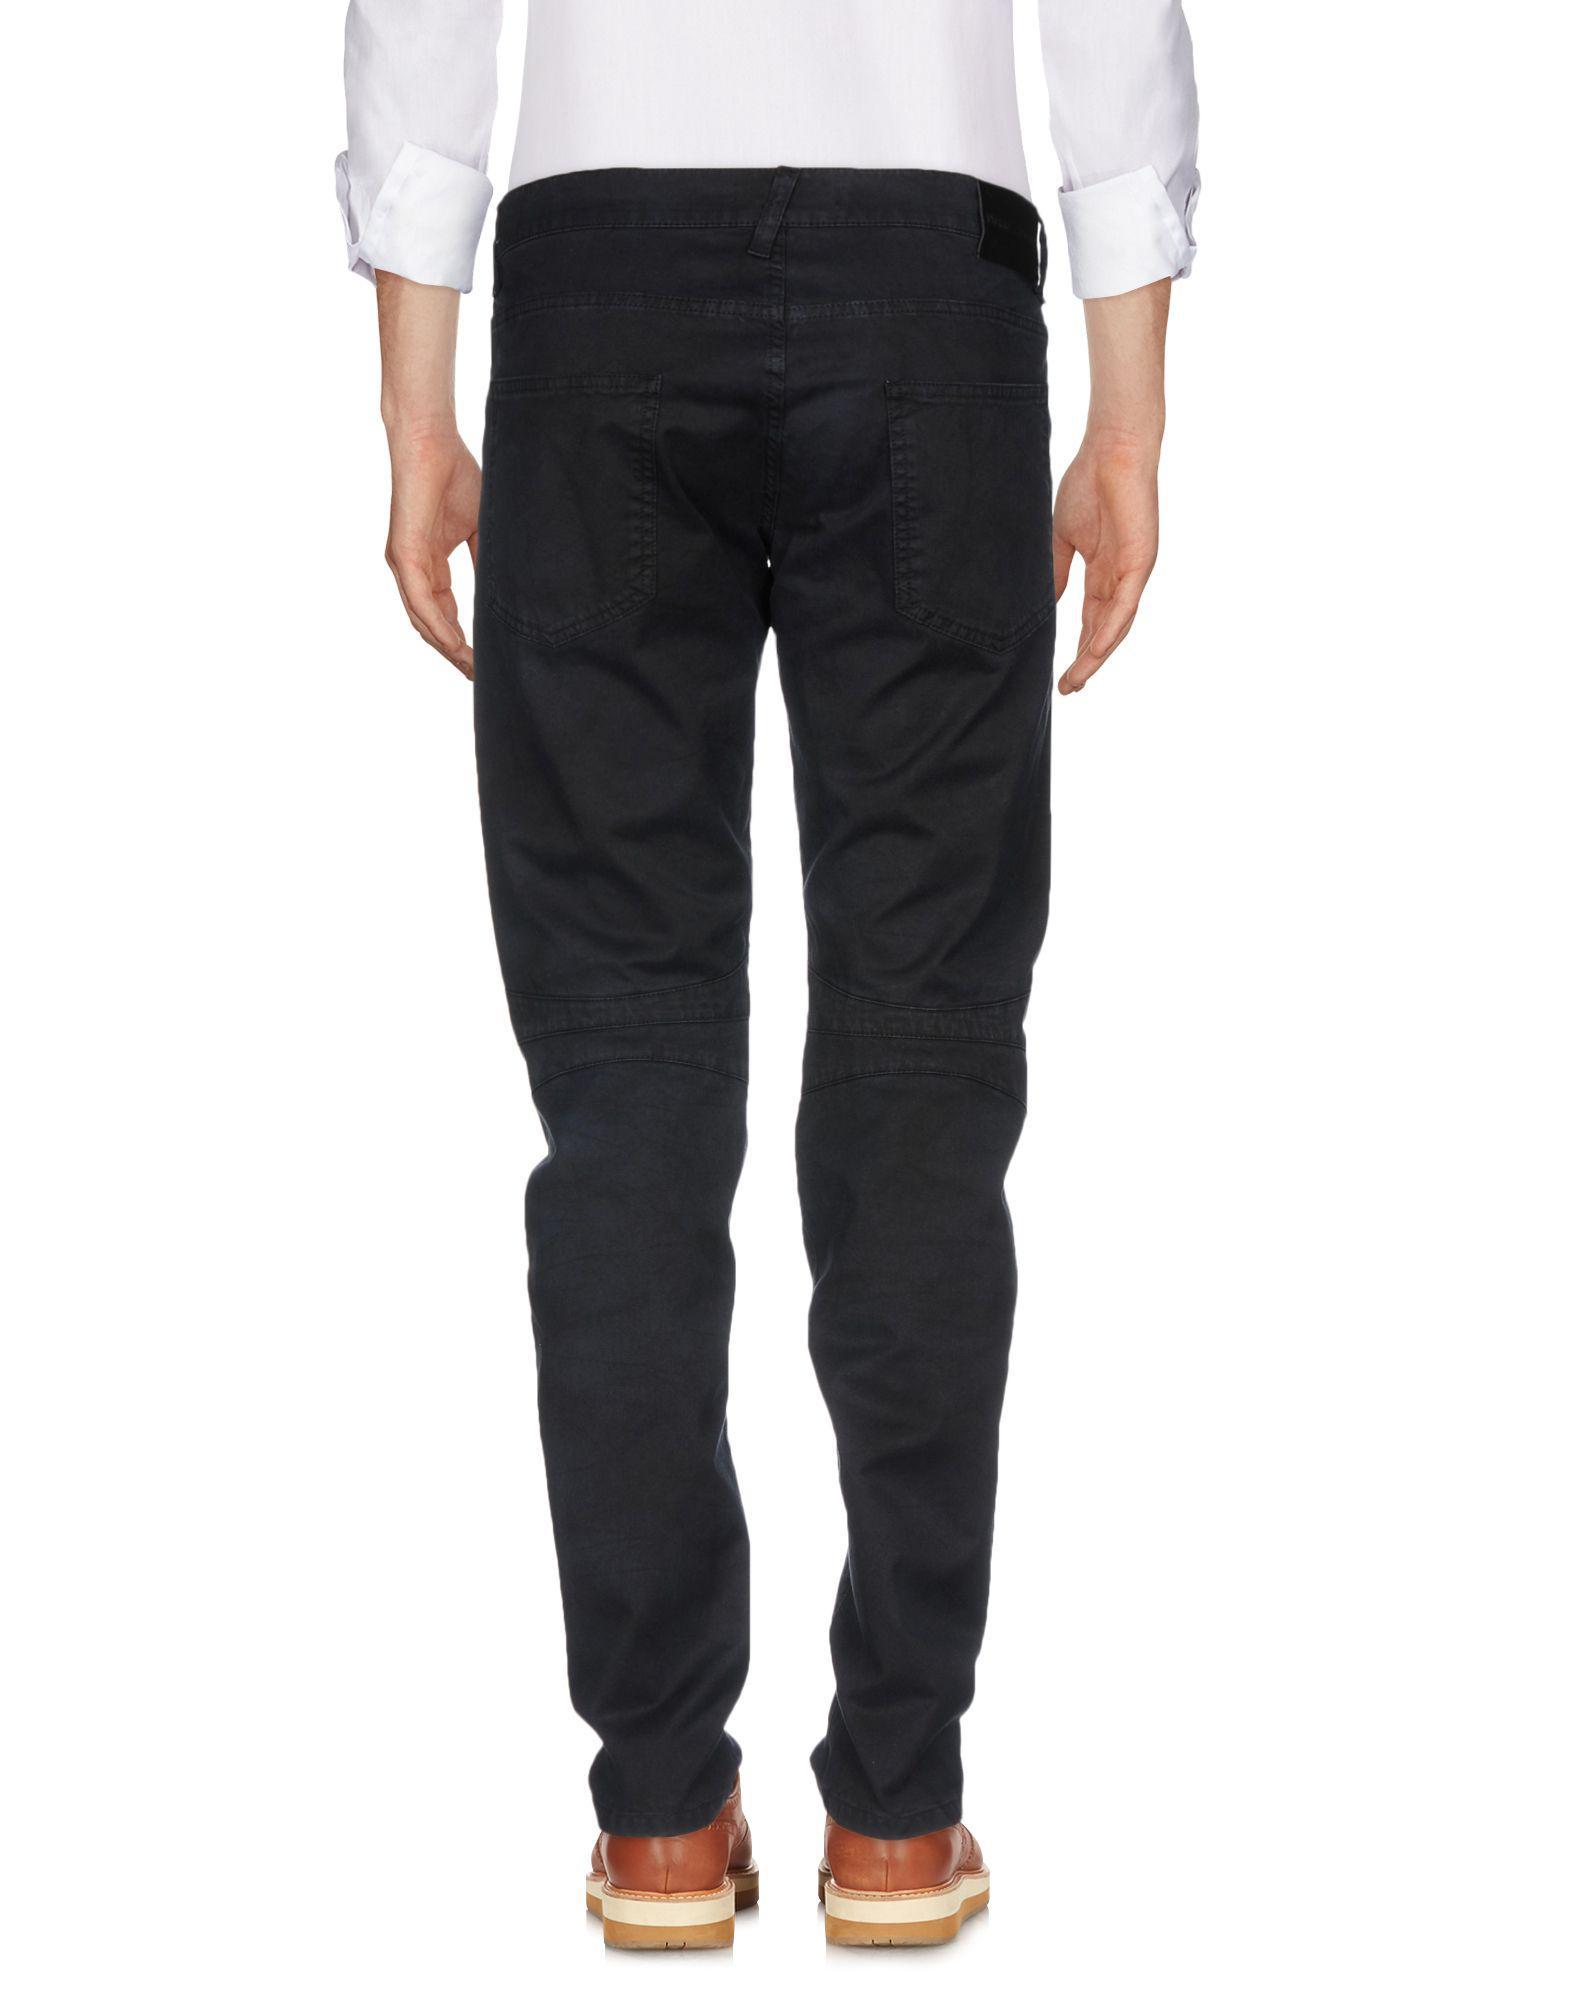 Balmain Leather Casual Trouser in Dark Blue (Blue) for Men